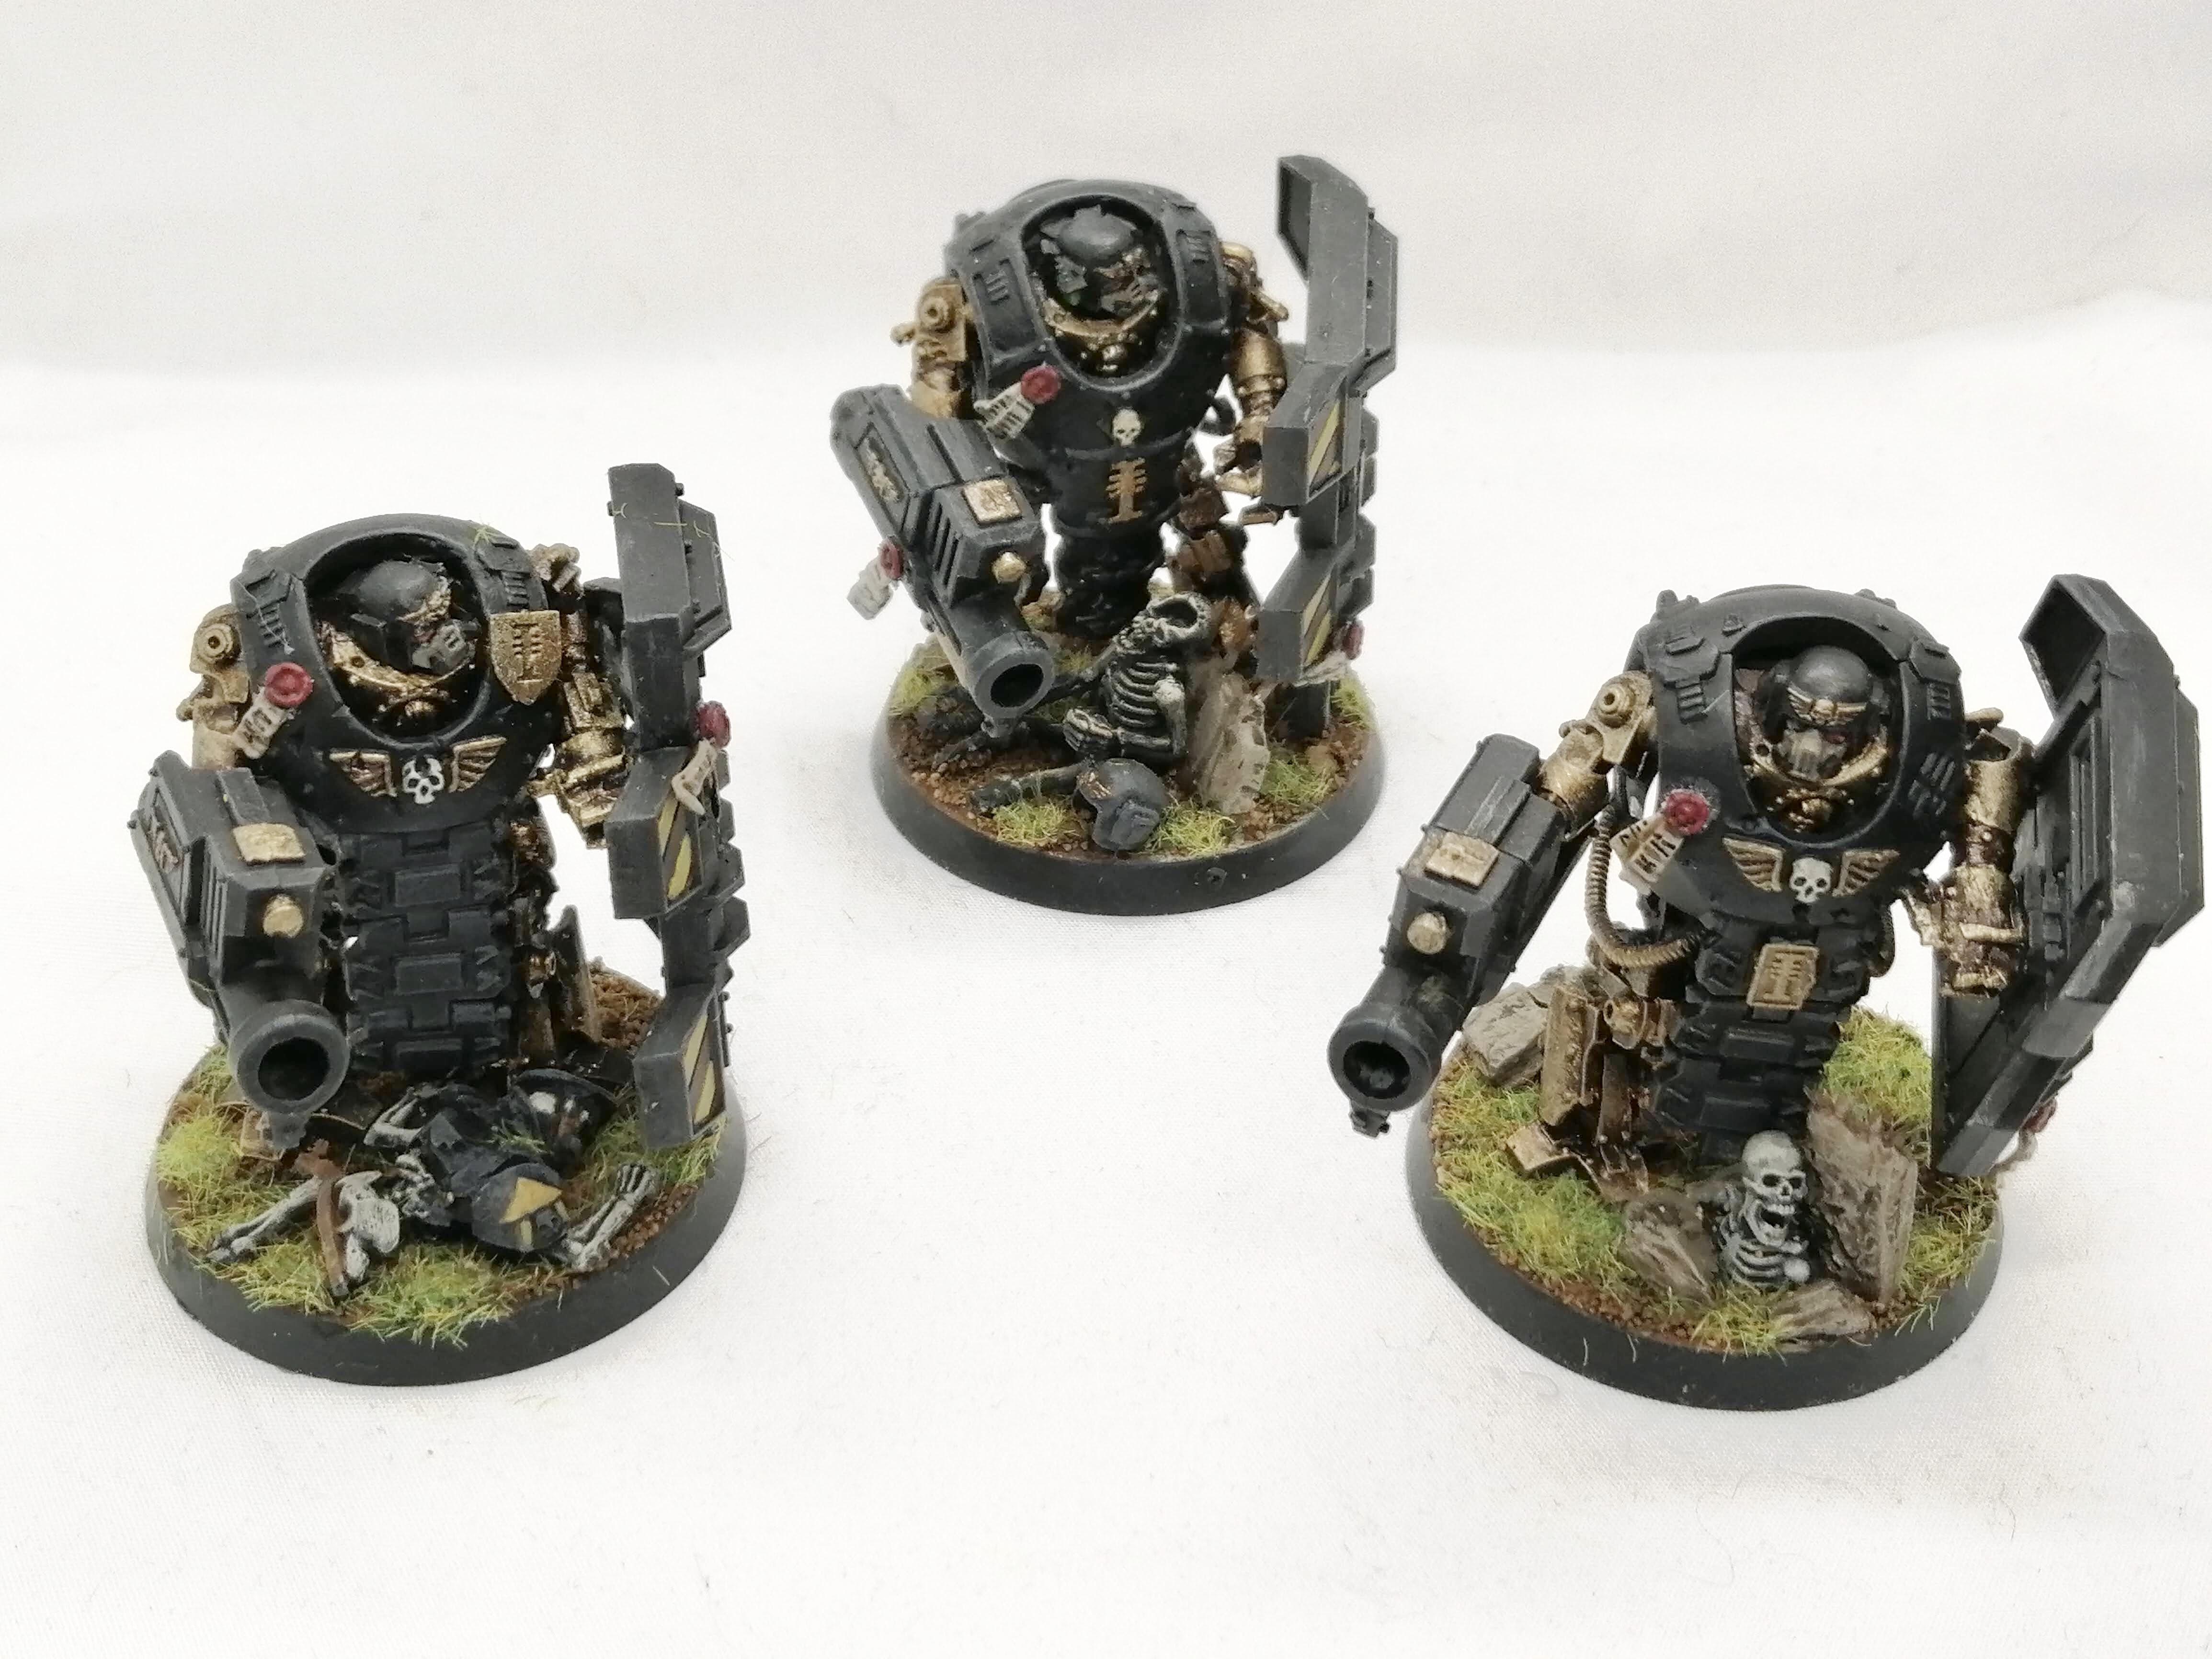 Astra Militarum, Conversion, Guard, Imperial, Kitbash, Warhammer 40,000, Warhammer Fantasy